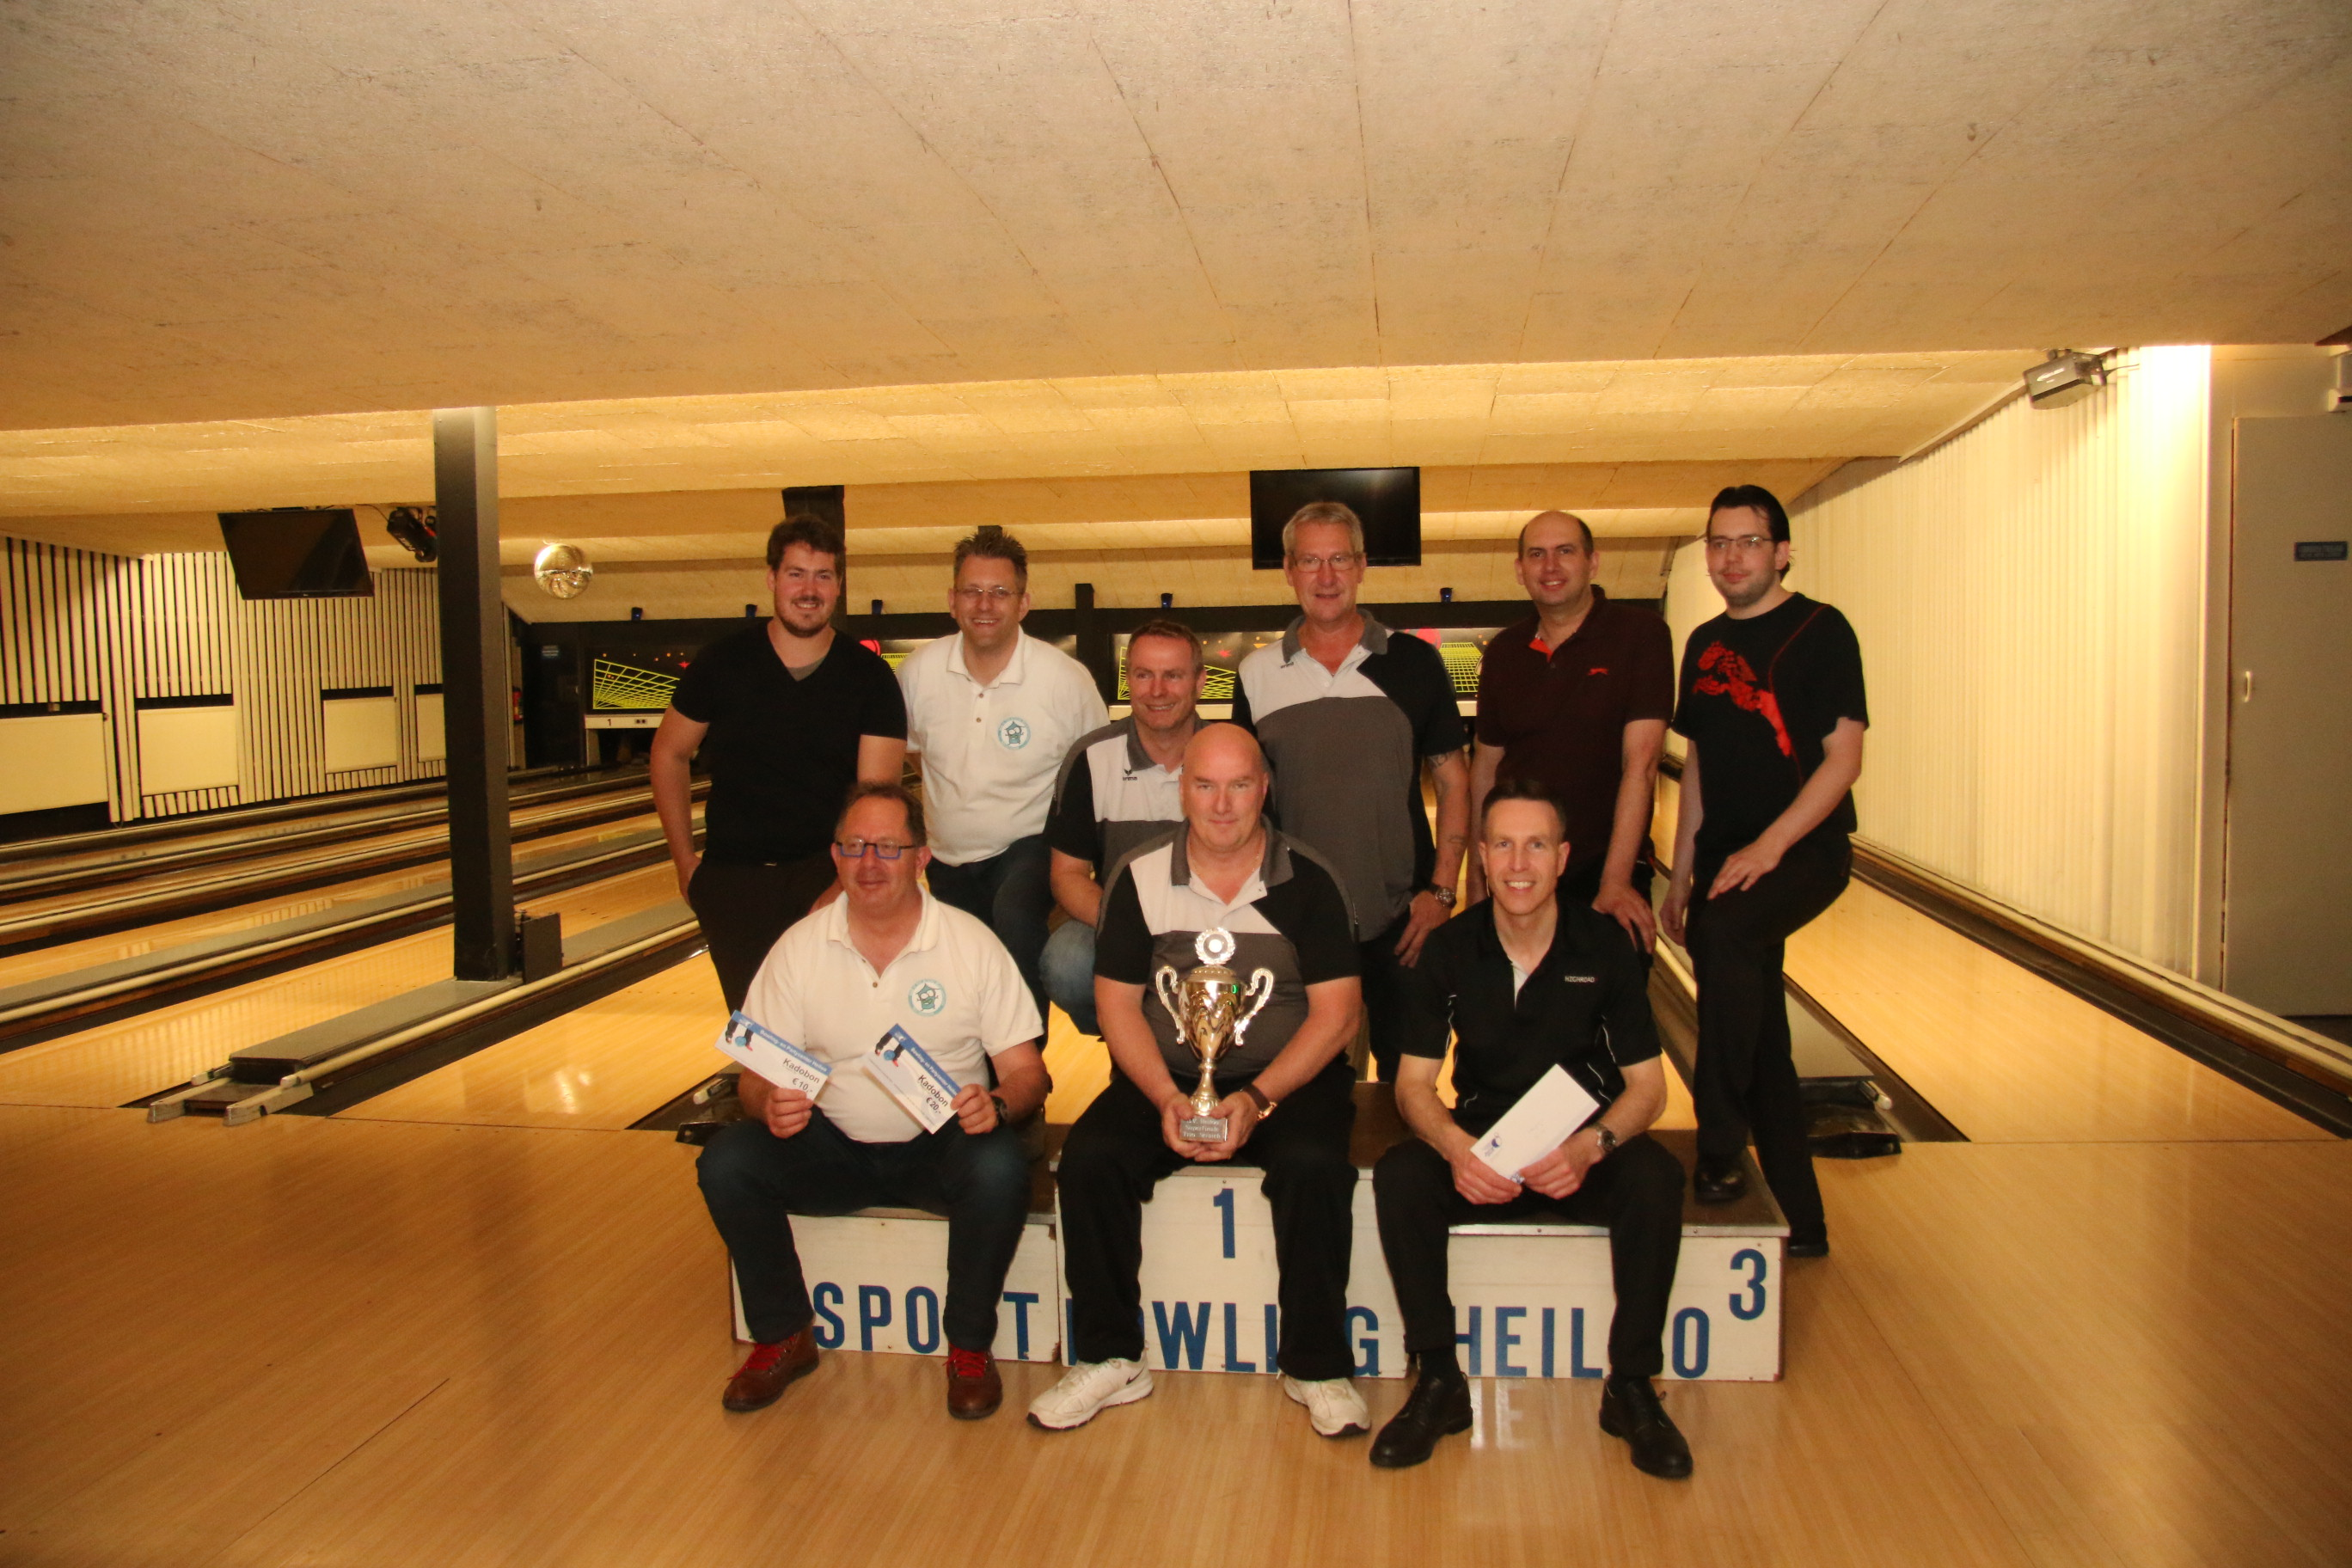 http://www.bowlingverenigingheiloo.nl/fotos_verhalen/foto's/2016_0526-SupFin-Scratch.jpg